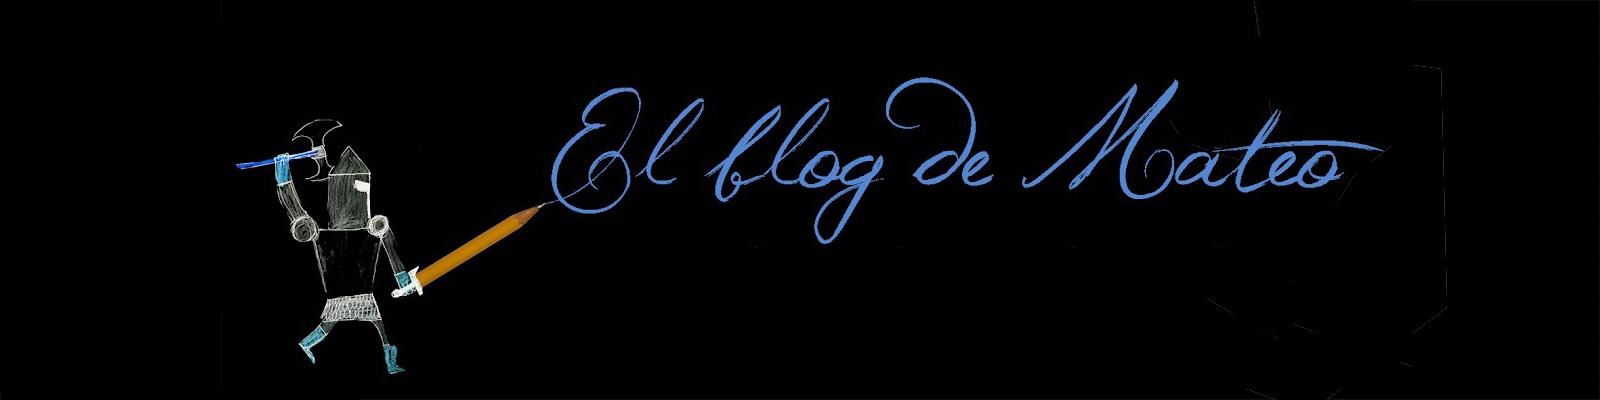 mateo blog